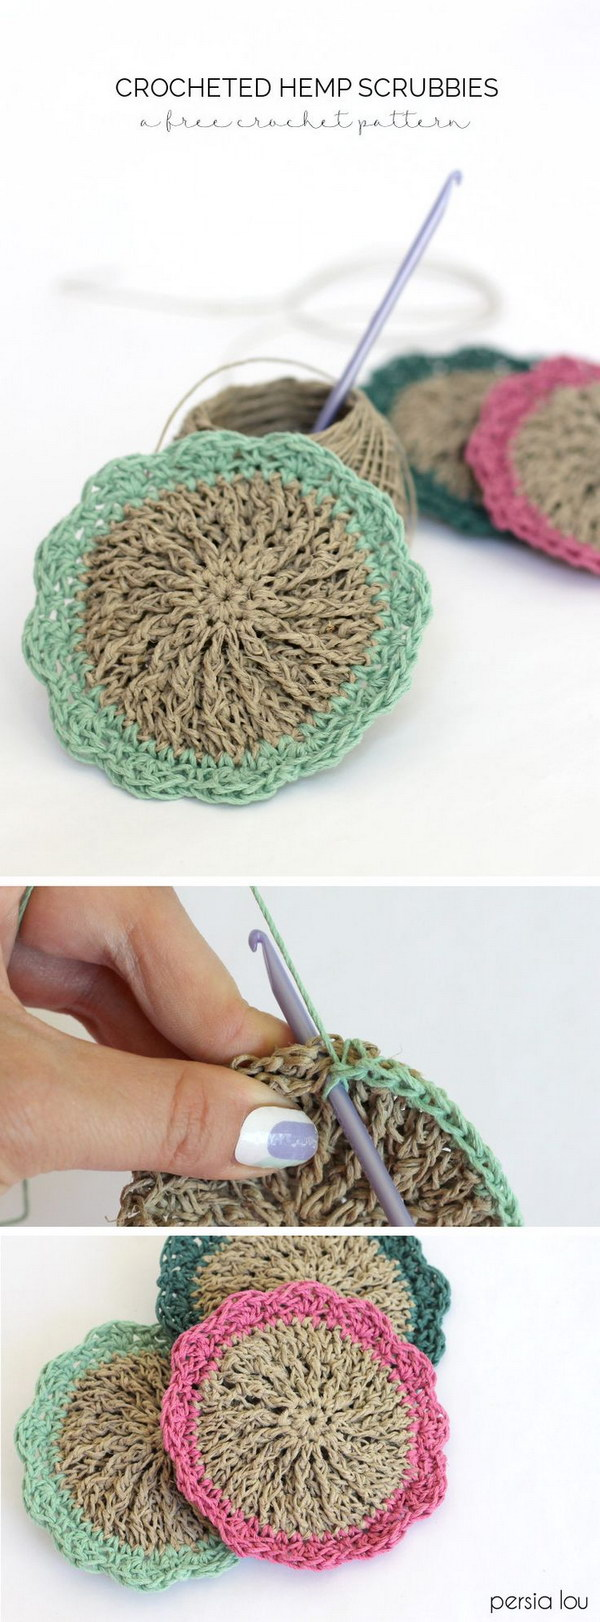 Crocheted Hemp Scrubbies.